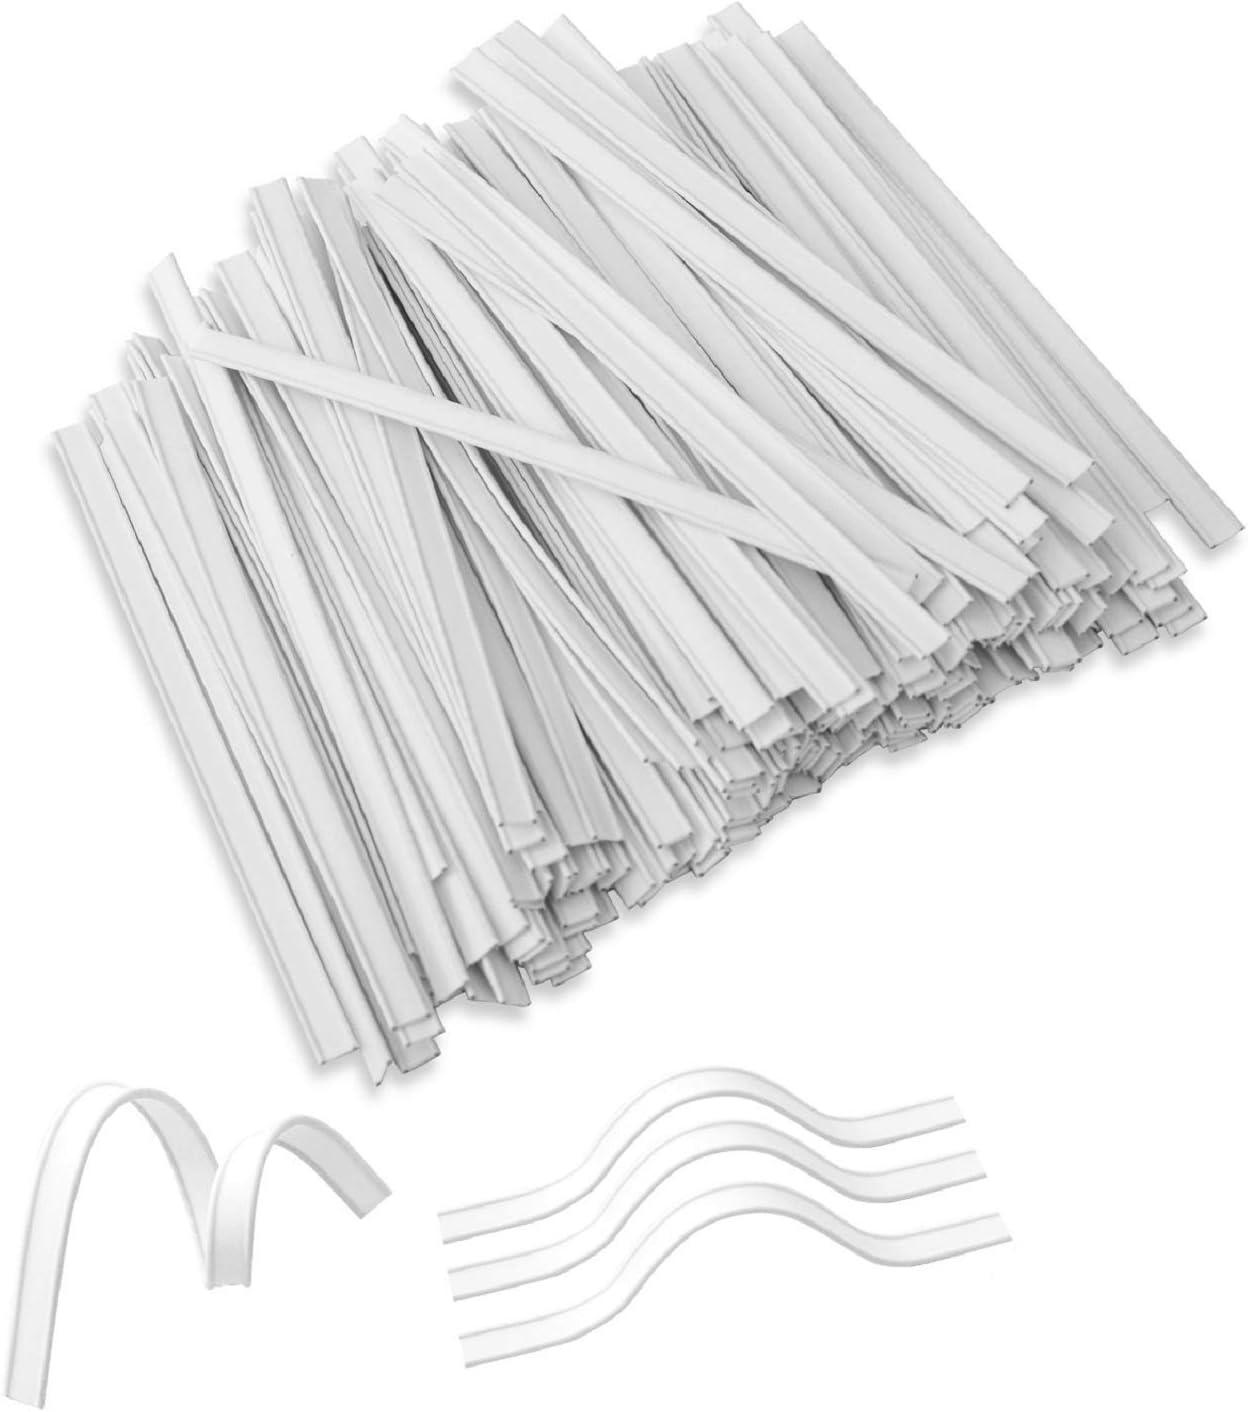 patillas de nariz de alta calidad para productos Behelf de aluminio de alta calidad Morfone 100 unidades de arco nasal para protecci/ón bucal env/ío a trav/és de